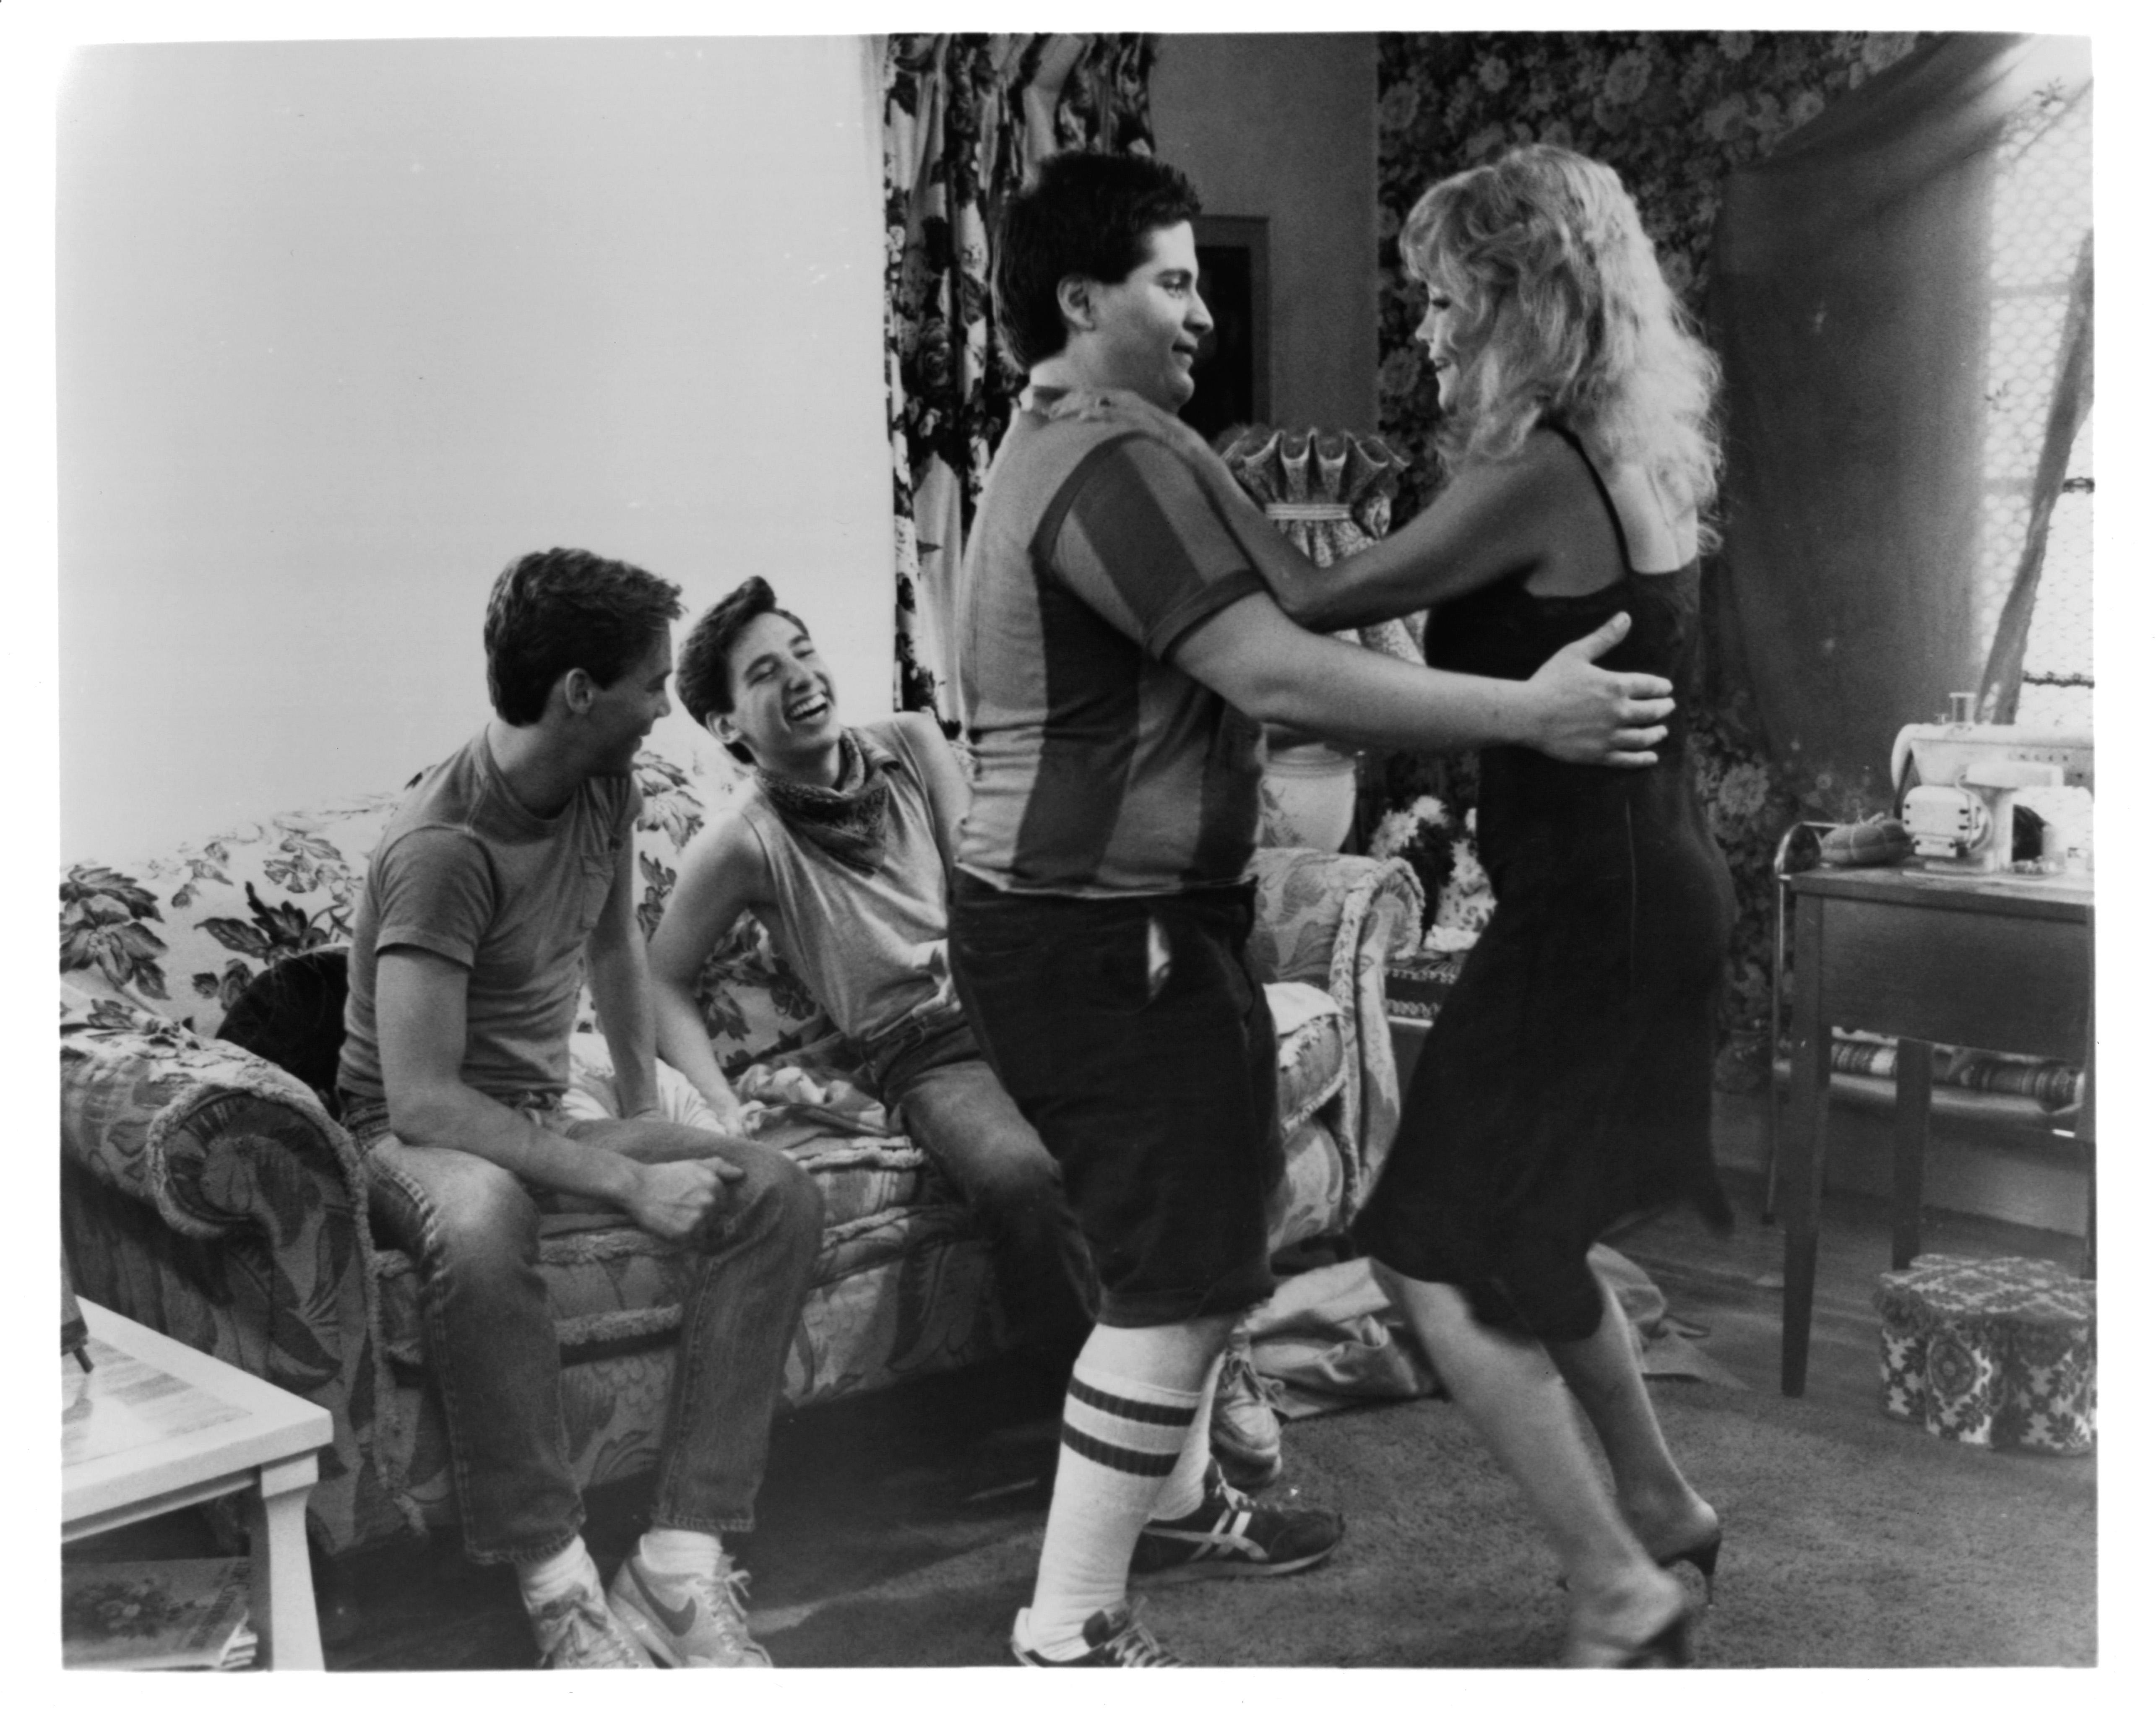 Steve Antin, Lawrence Monoson, Louisa Moritz, and Joe Rubbo in The Last American Virgin (1982)